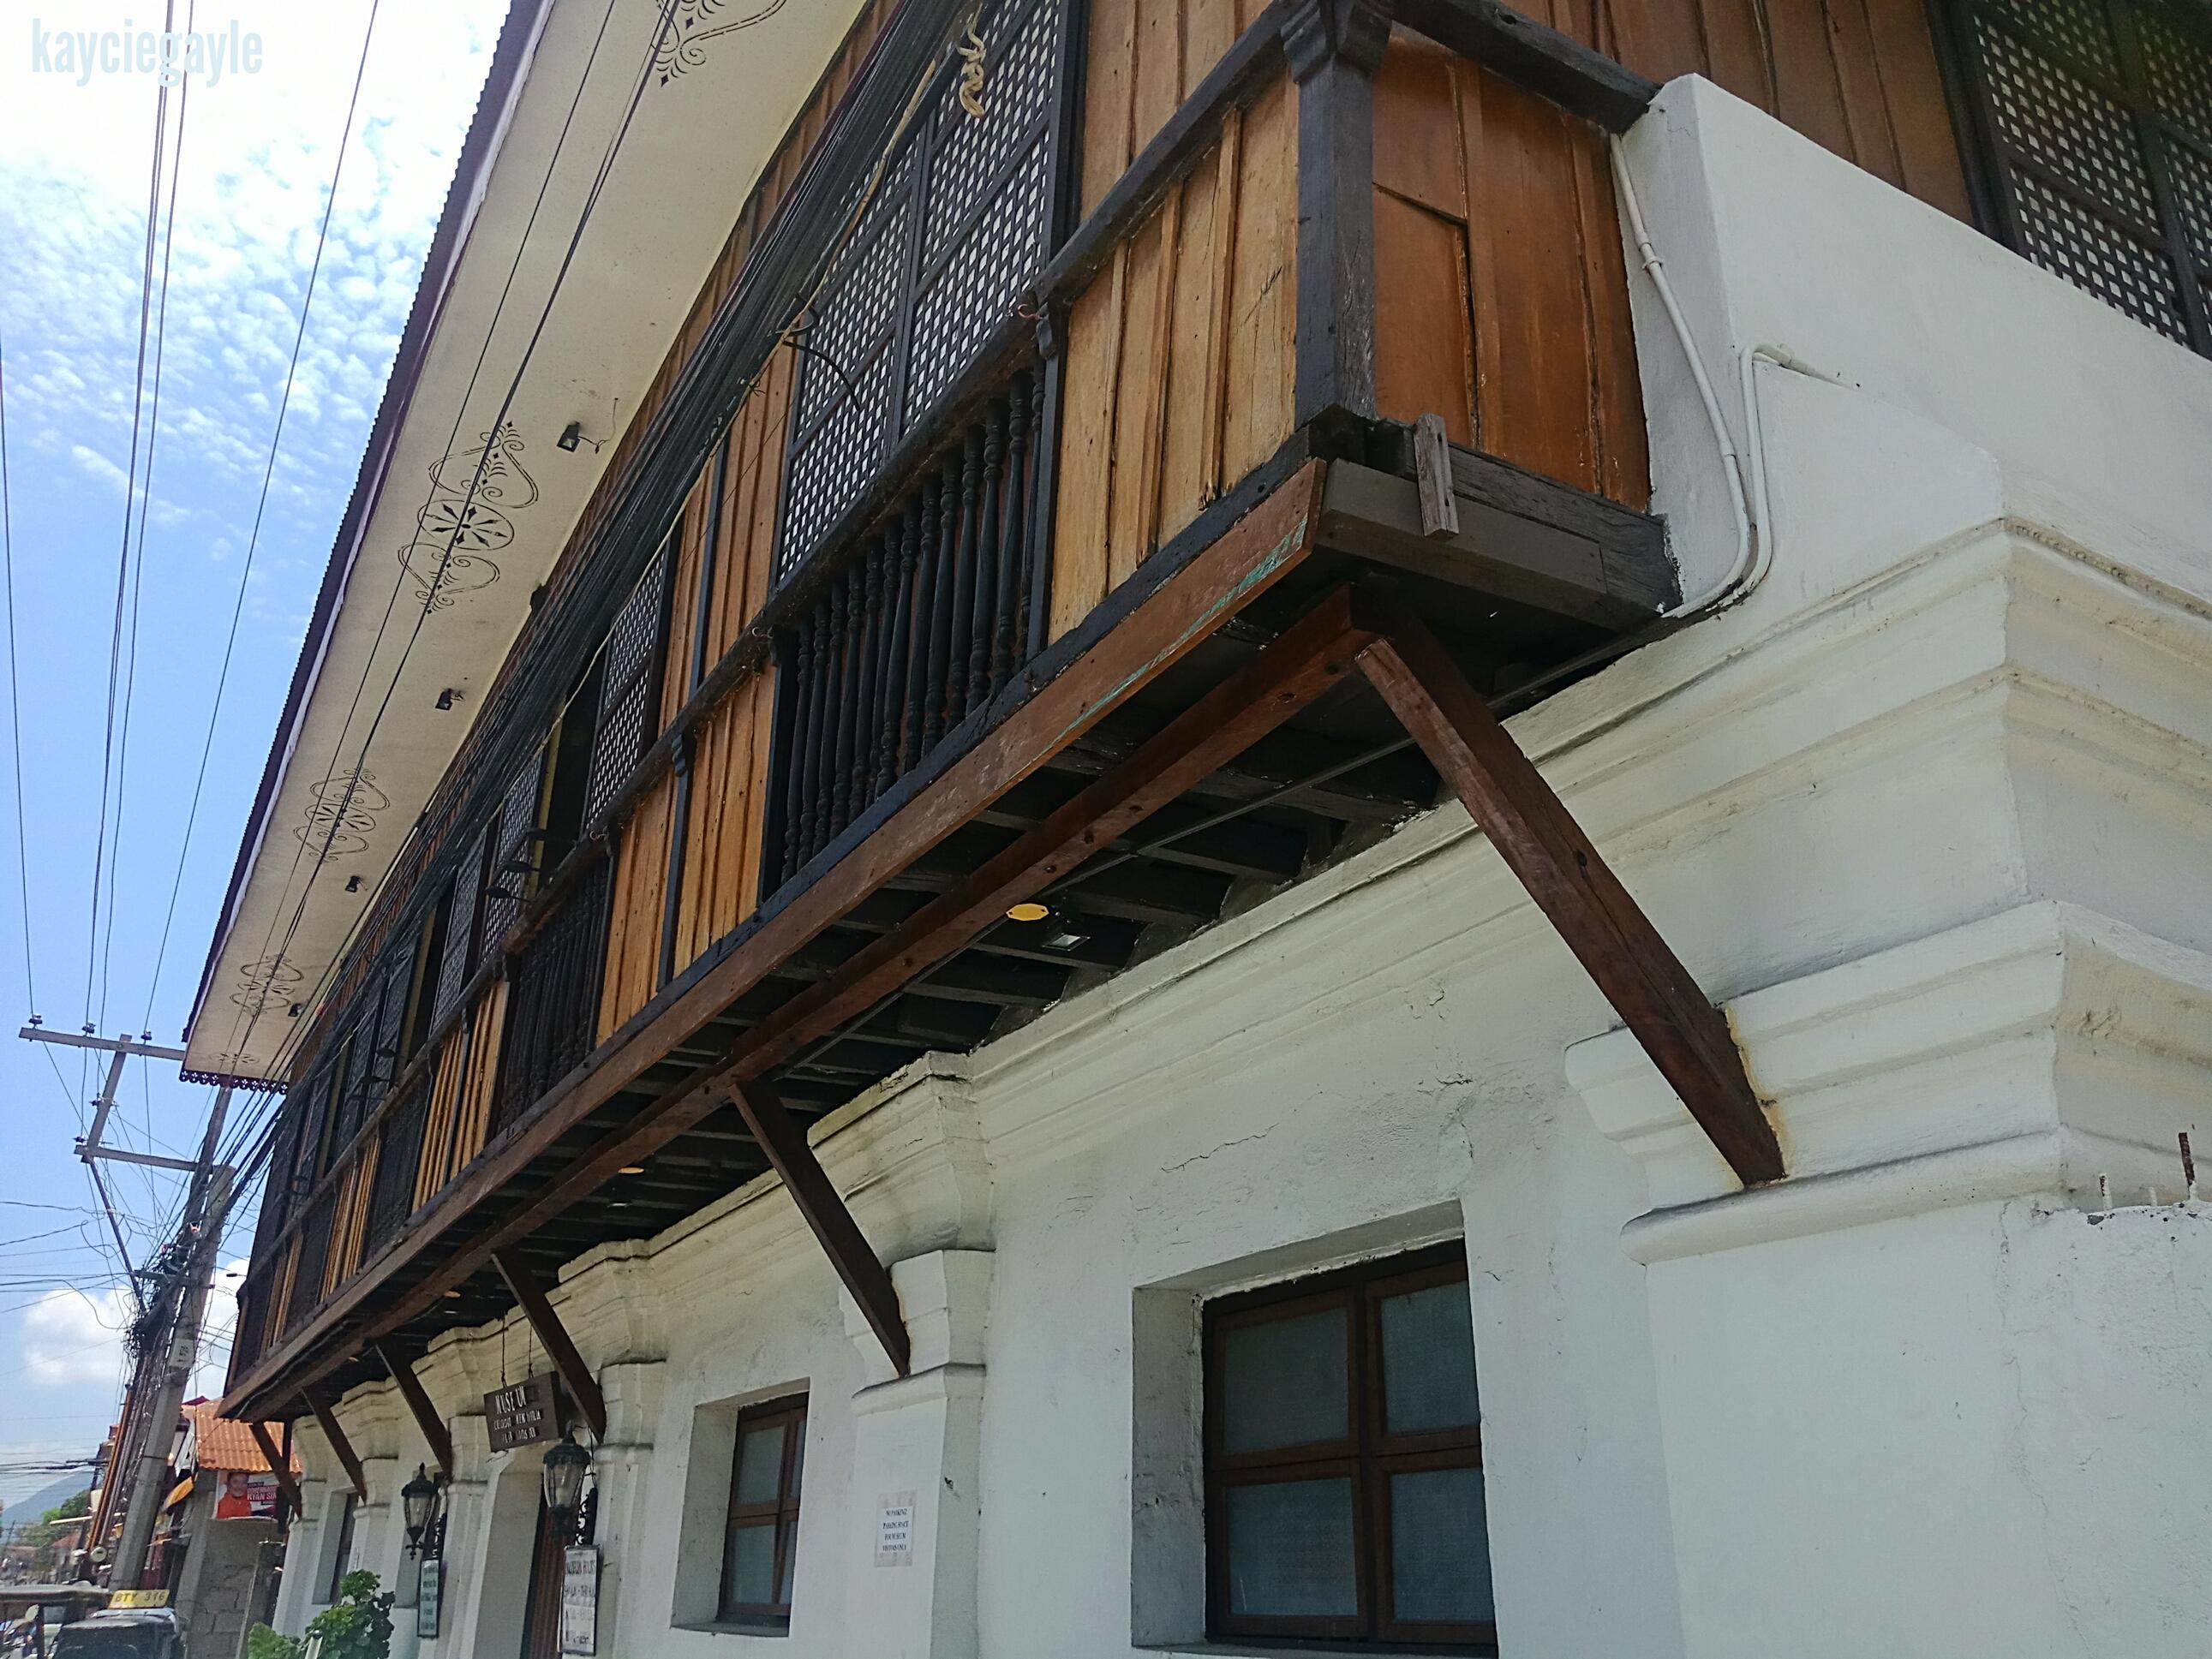 Crisologo Museum Vigan Ilocos Sur Philippines Two-story house